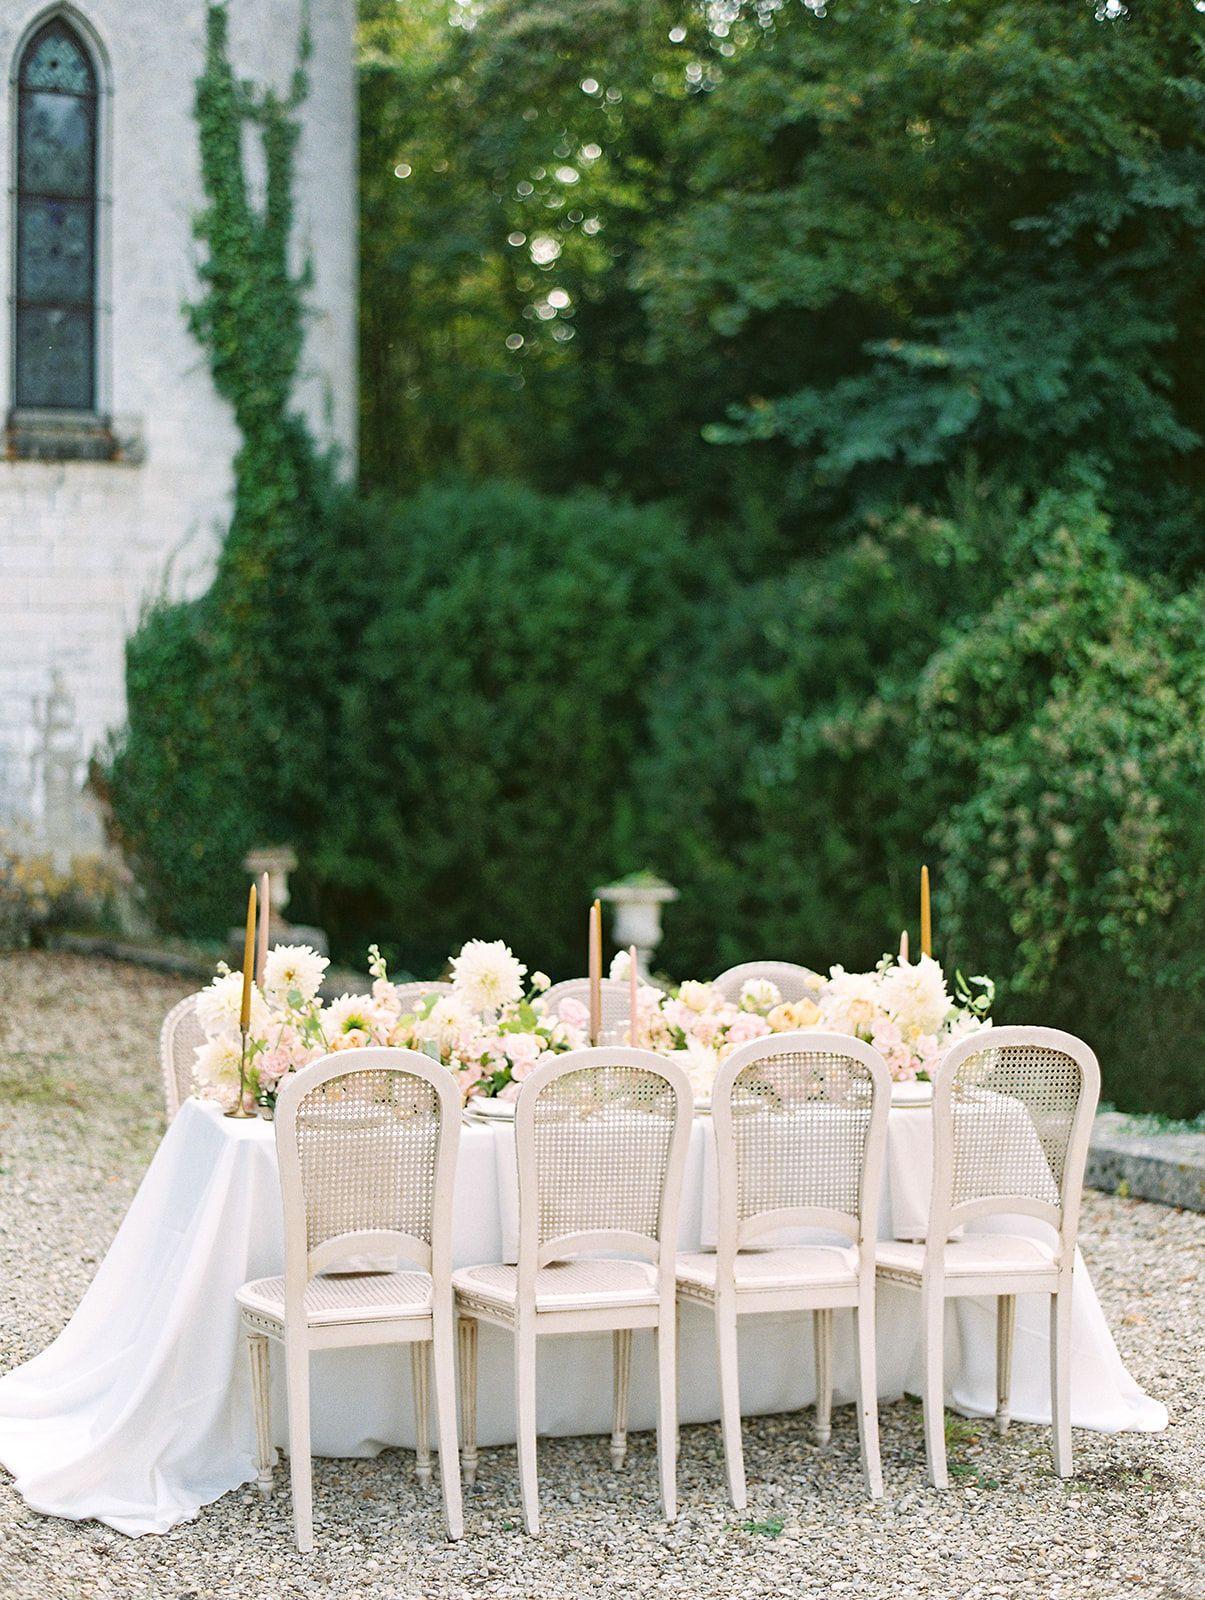 60+ Best Ivory & Champagne | Wedding Decor Inspiration images in 2020 |  champagne wedding, wedding, wedding decor inspiration